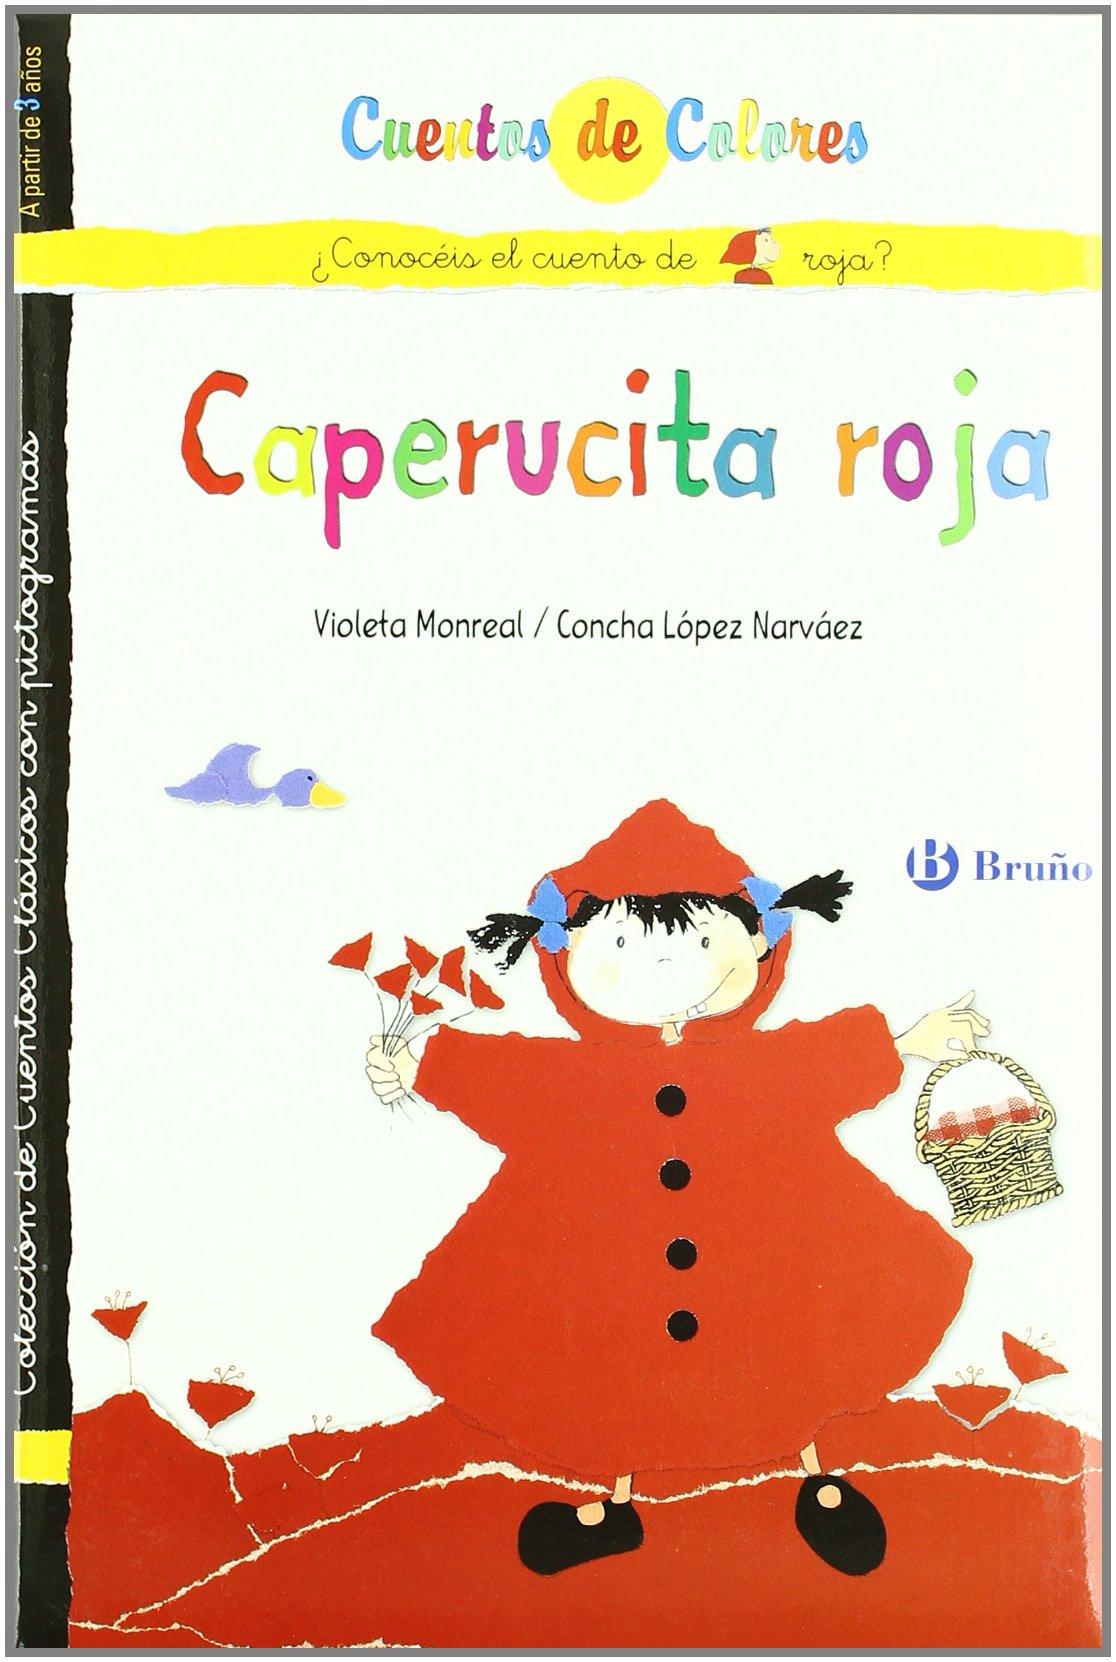 Caperucita roja & La abuelita de Caperucita roja / Little Red Riding Hood & Little Red Riding Hood's Grandmother (Cuentos De Colores / Color Stories) (Spanish Edition) PDF